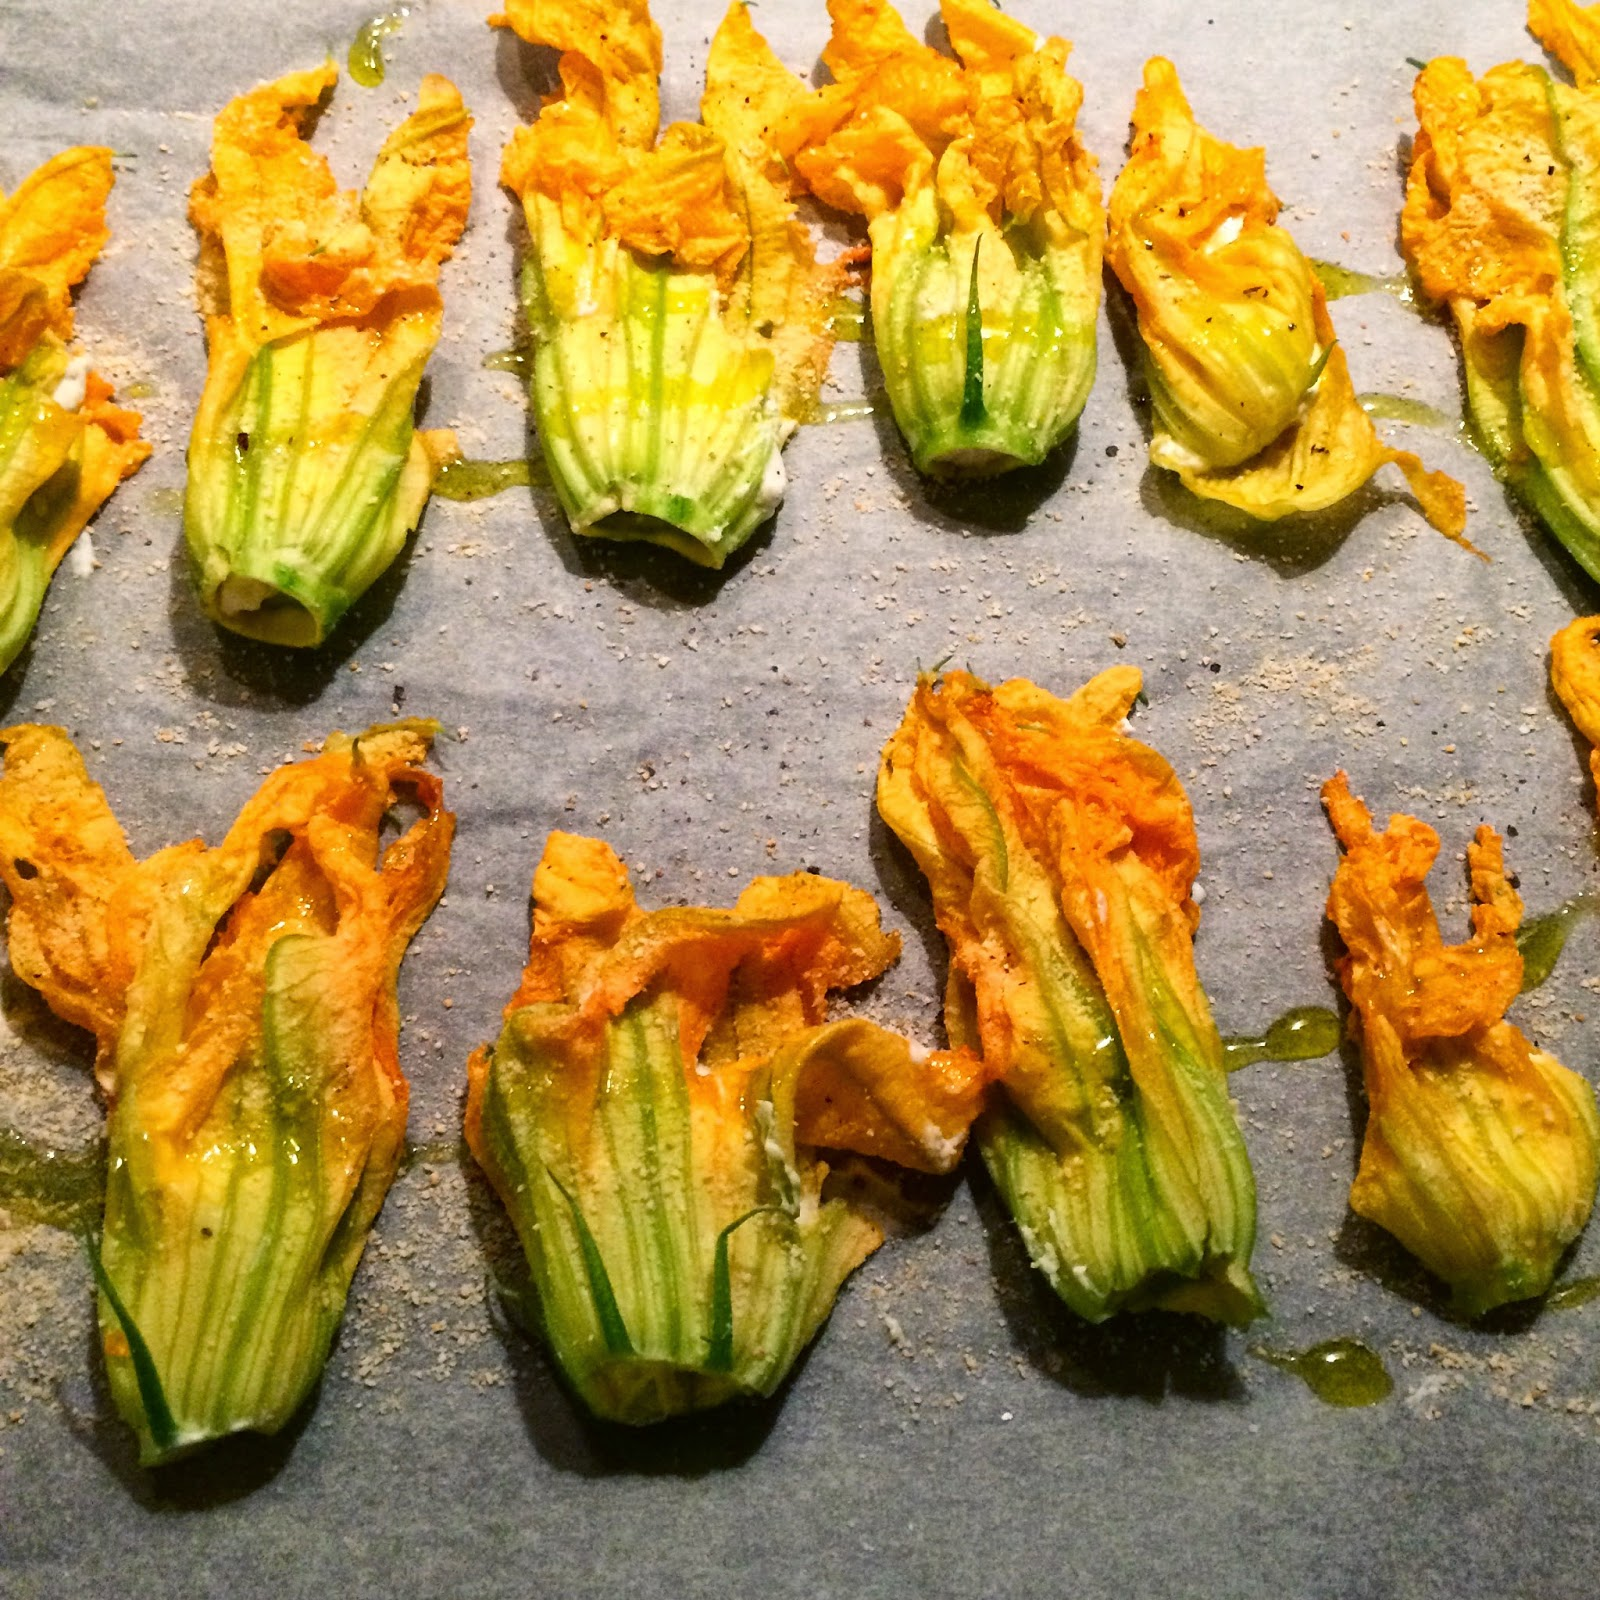 fiori di zucca ripieni light